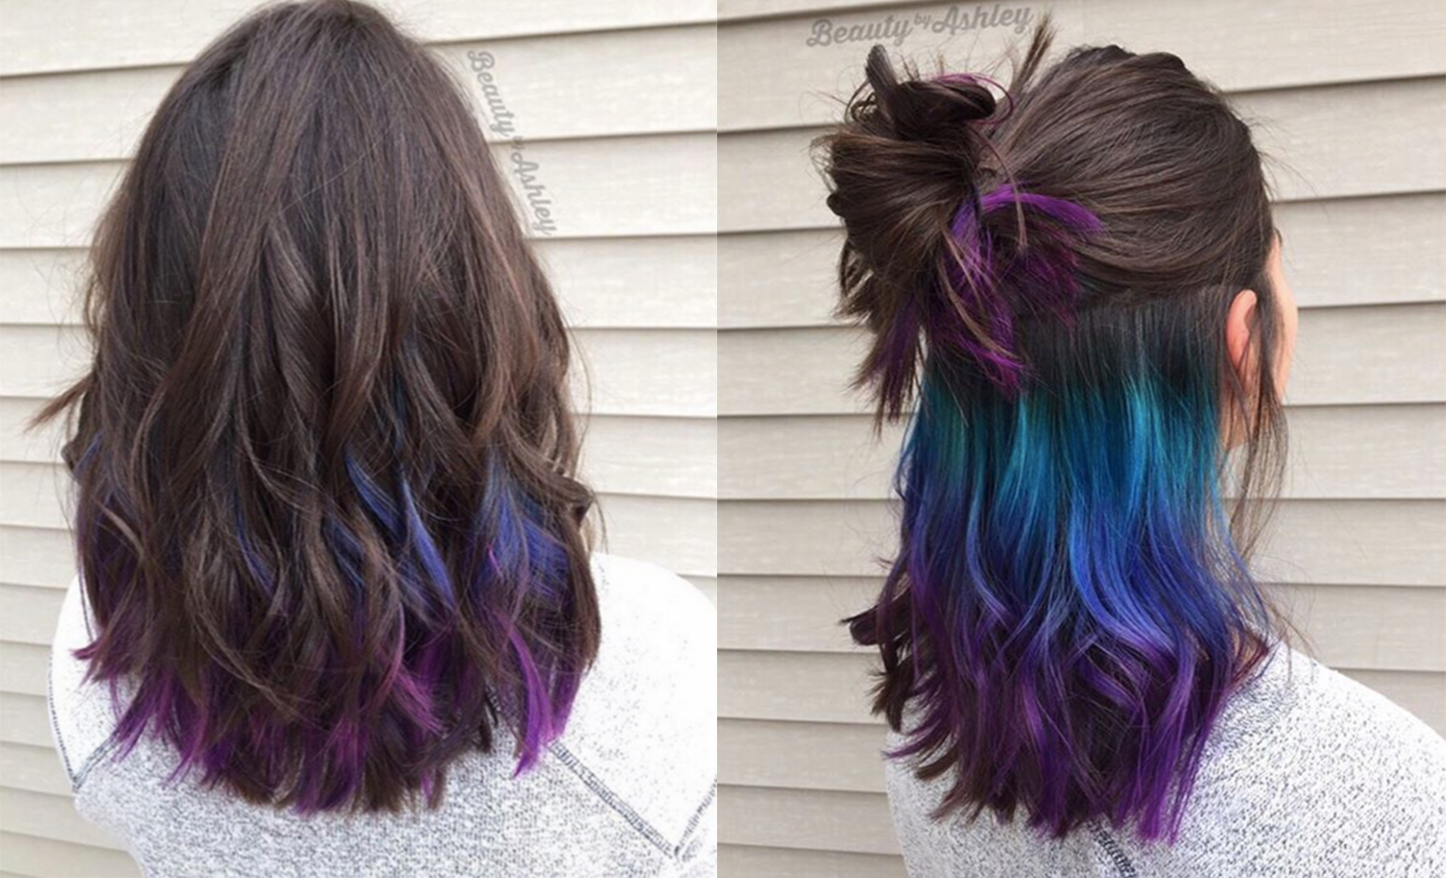 best 25+ colored hair ends ideas on pinterest | dip dye, dip dyed